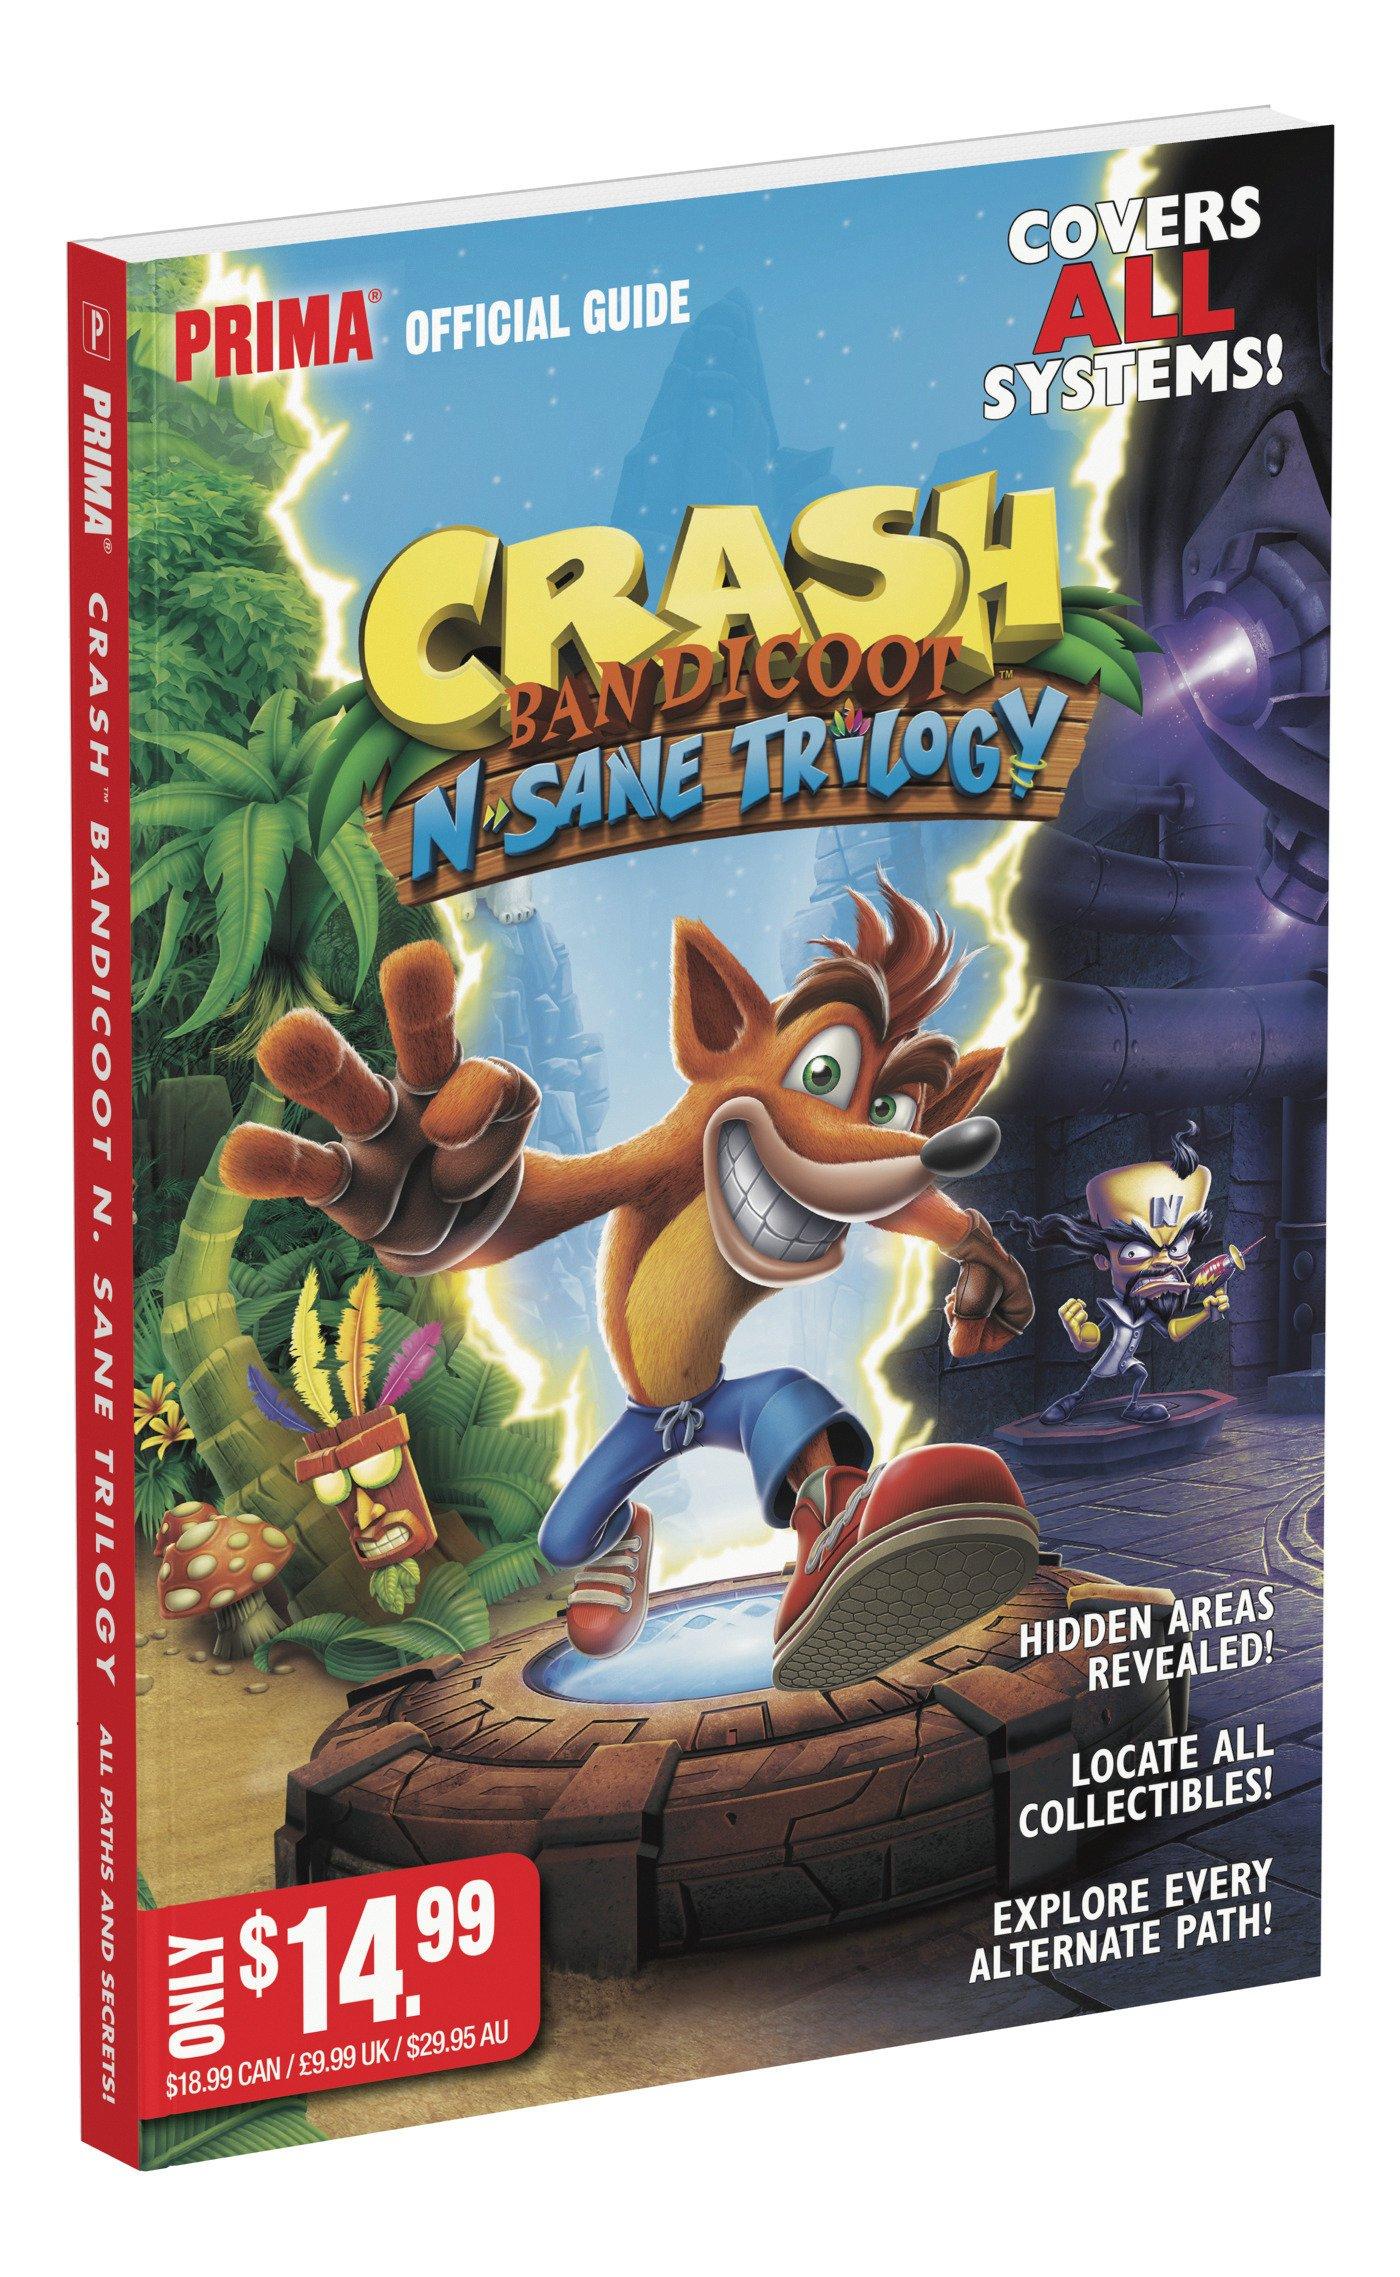 crash bandicoot n sane trilogy getting an official guide nintendo